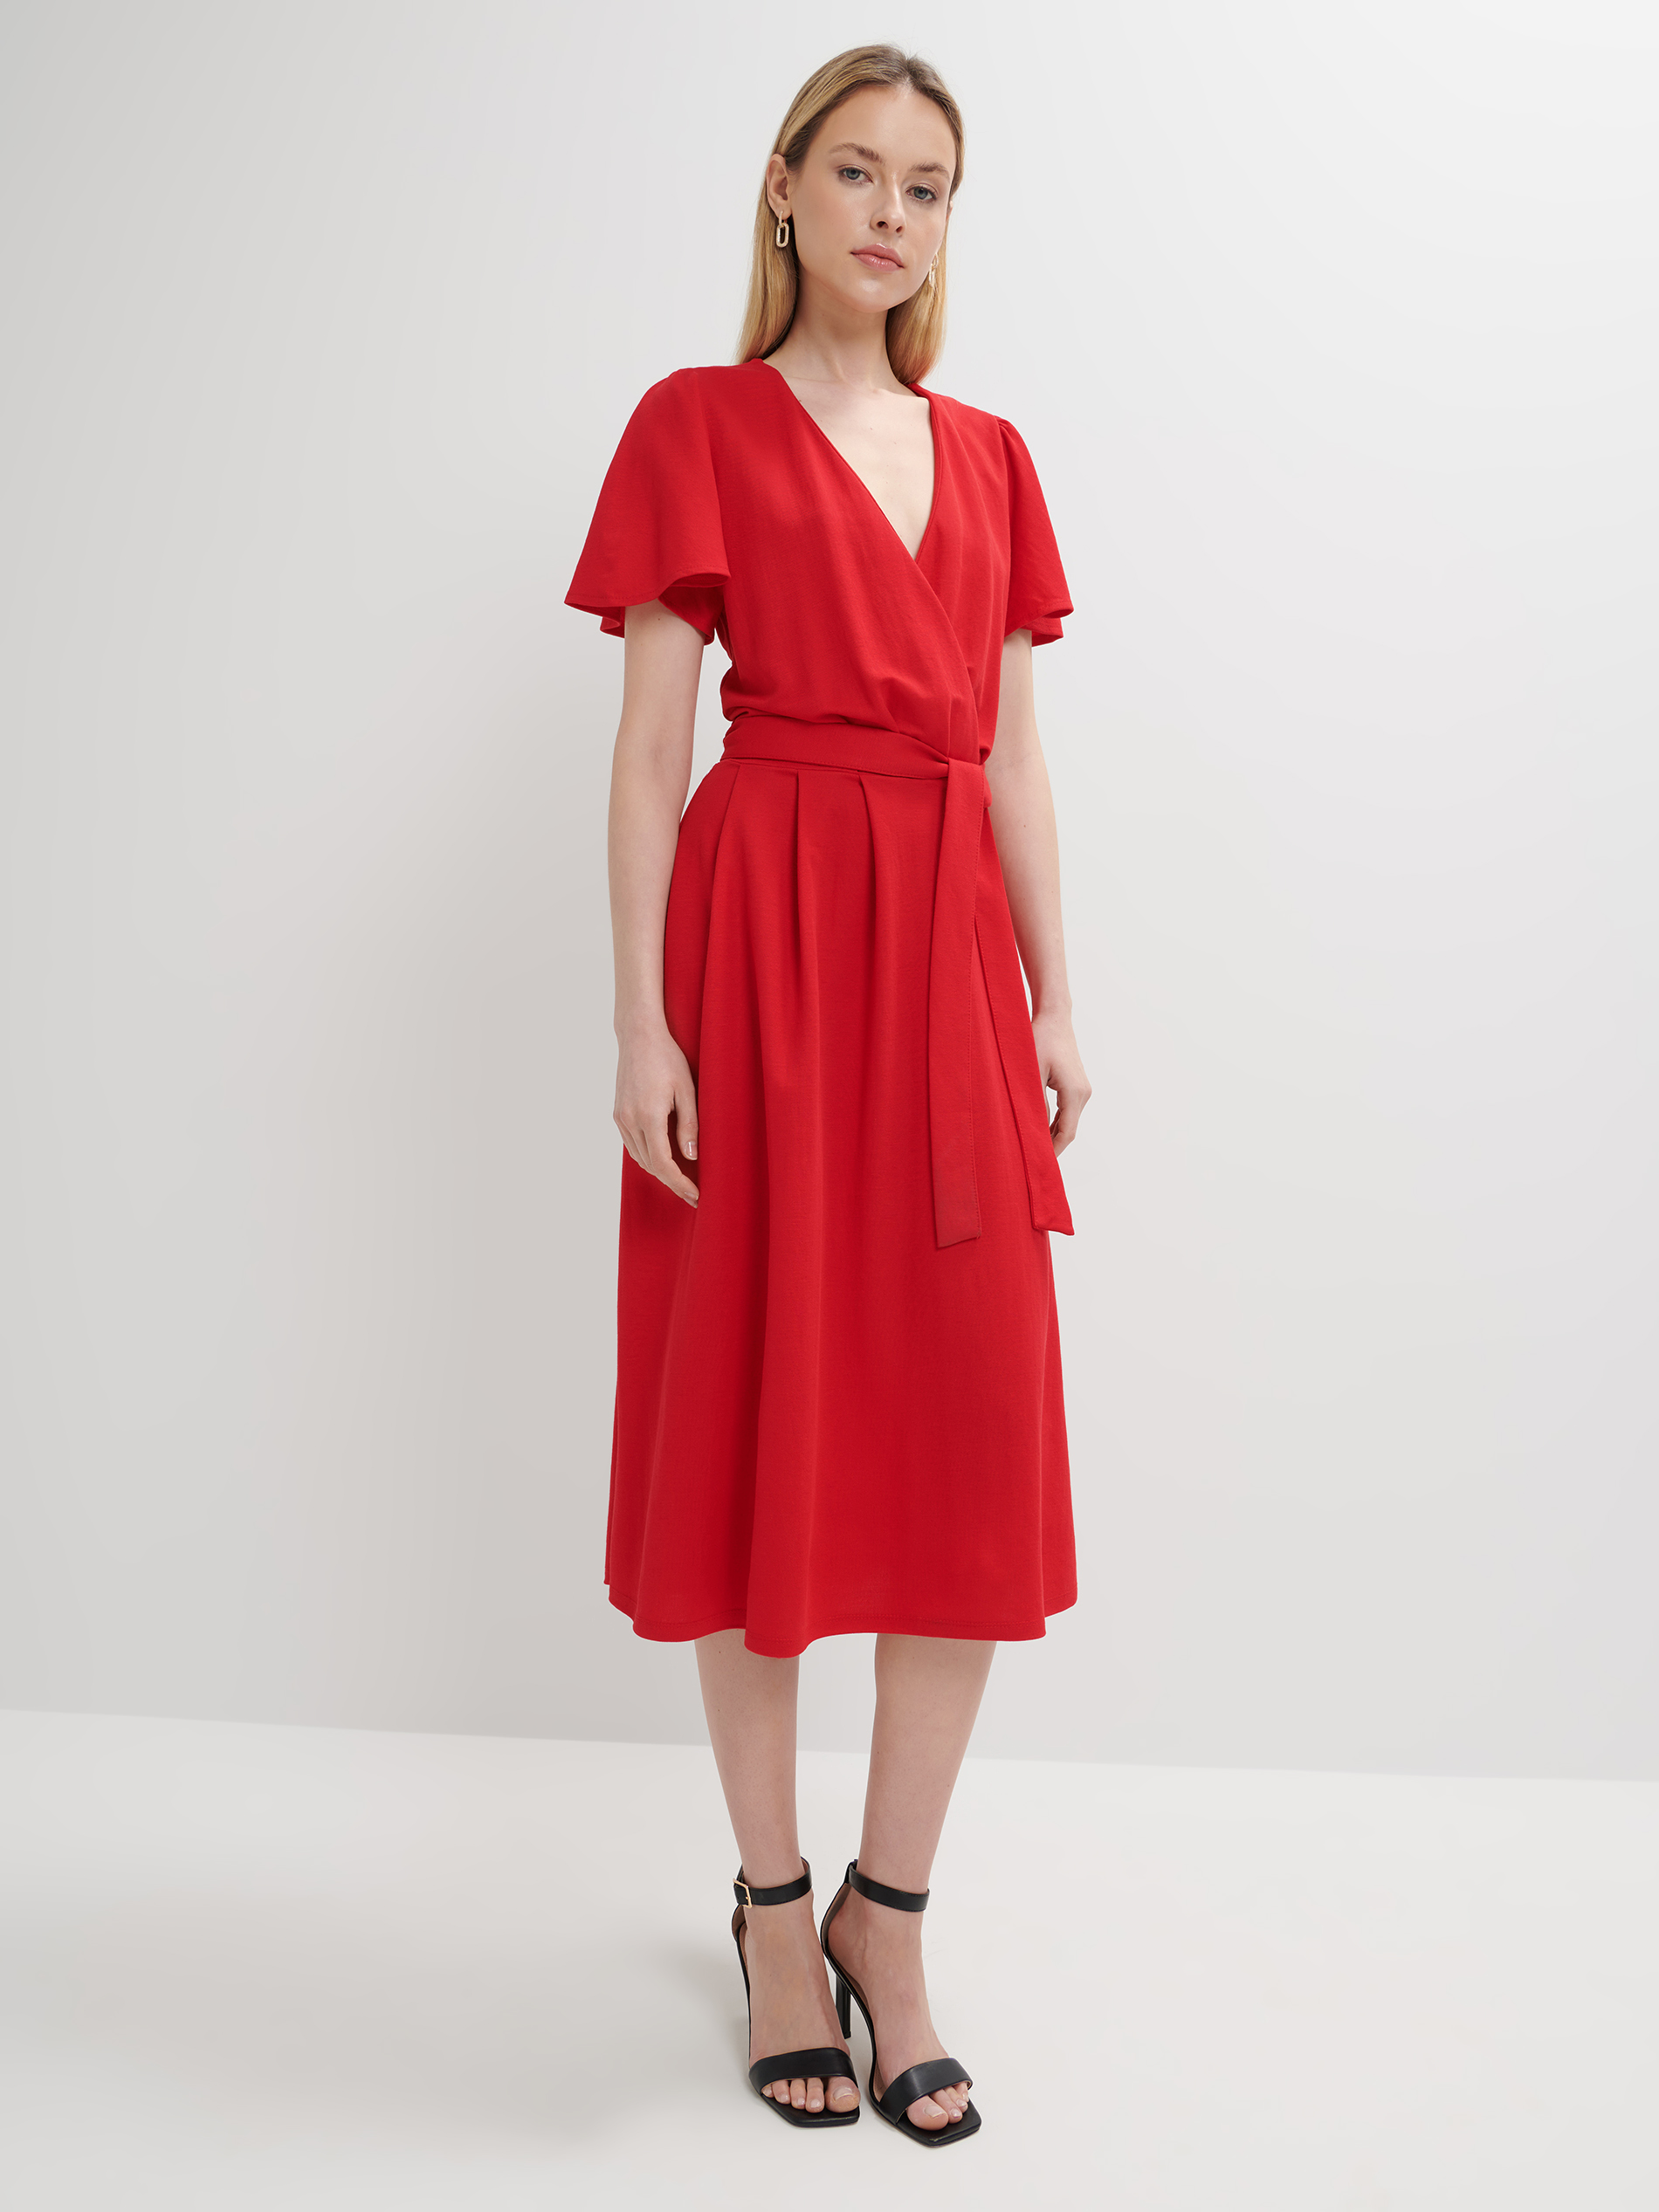 Mohito piros átlapolós ruha